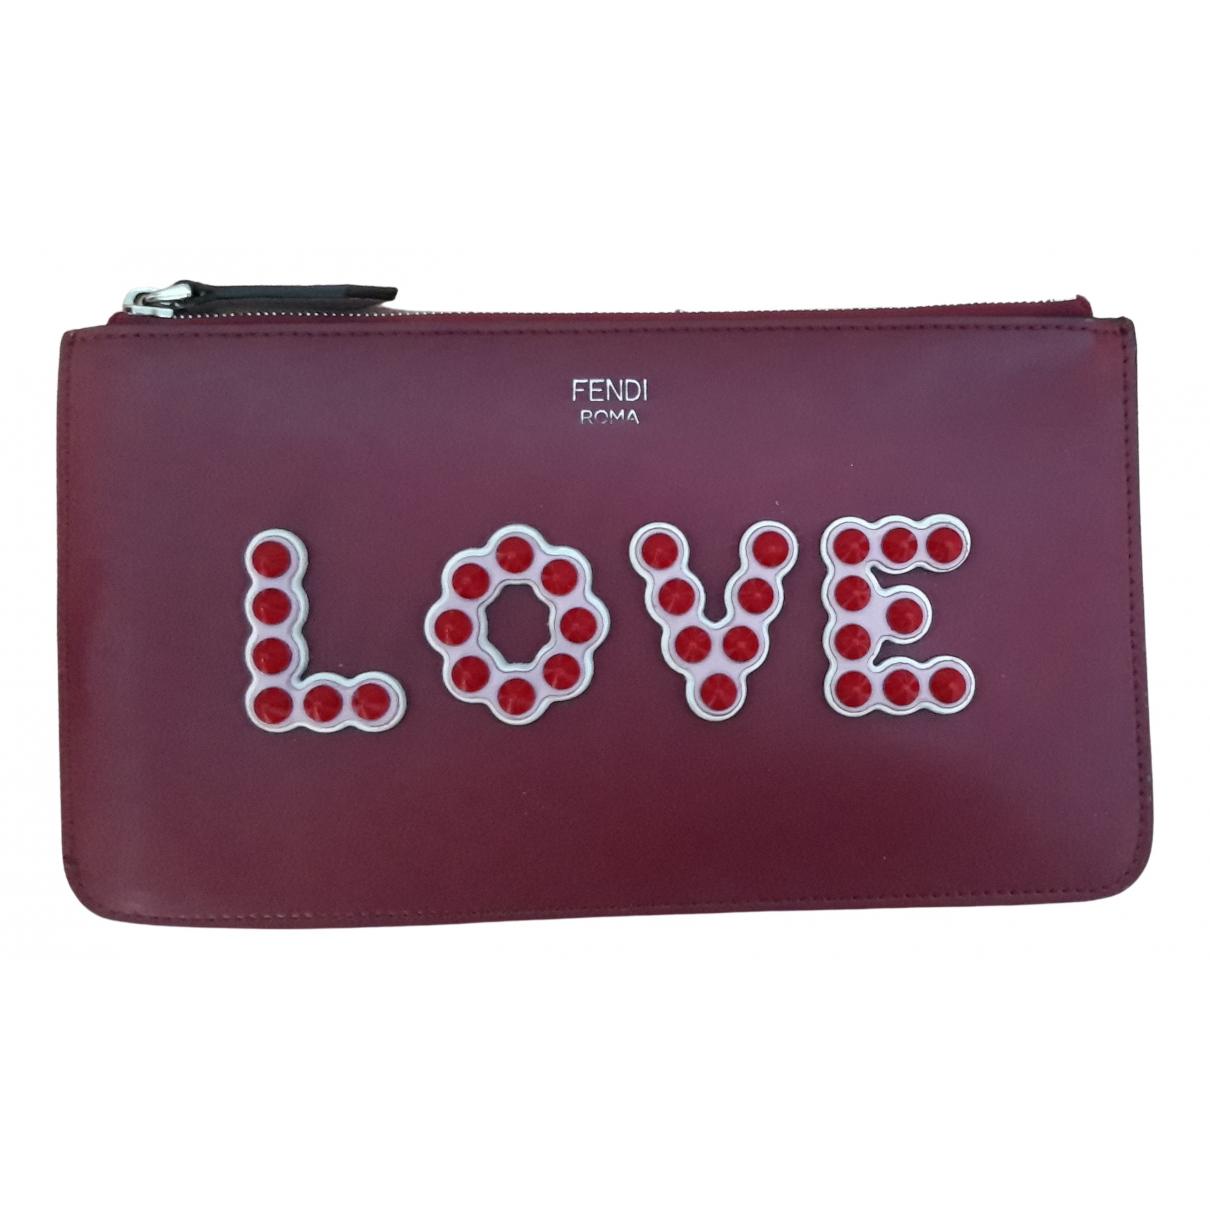 Fendi \N Burgundy Leather Clutch bag for Women \N